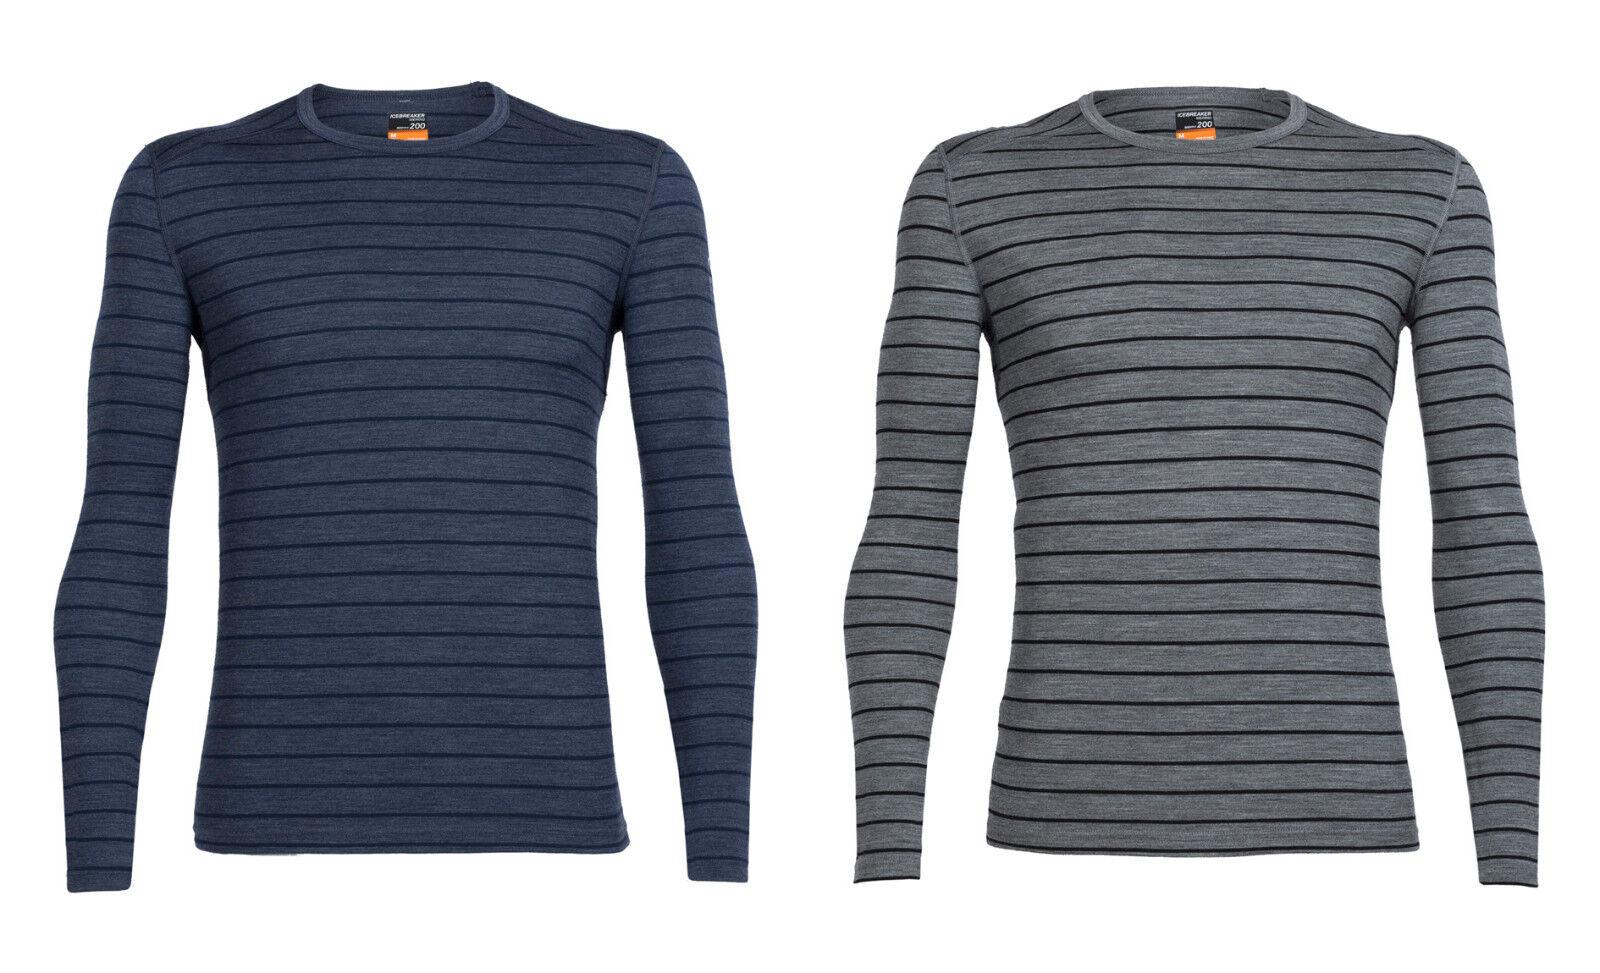 Icebreaker Mens Oasis Long Sleeve Crewe Stripe - Versatile Sports Shirt 200g M ²